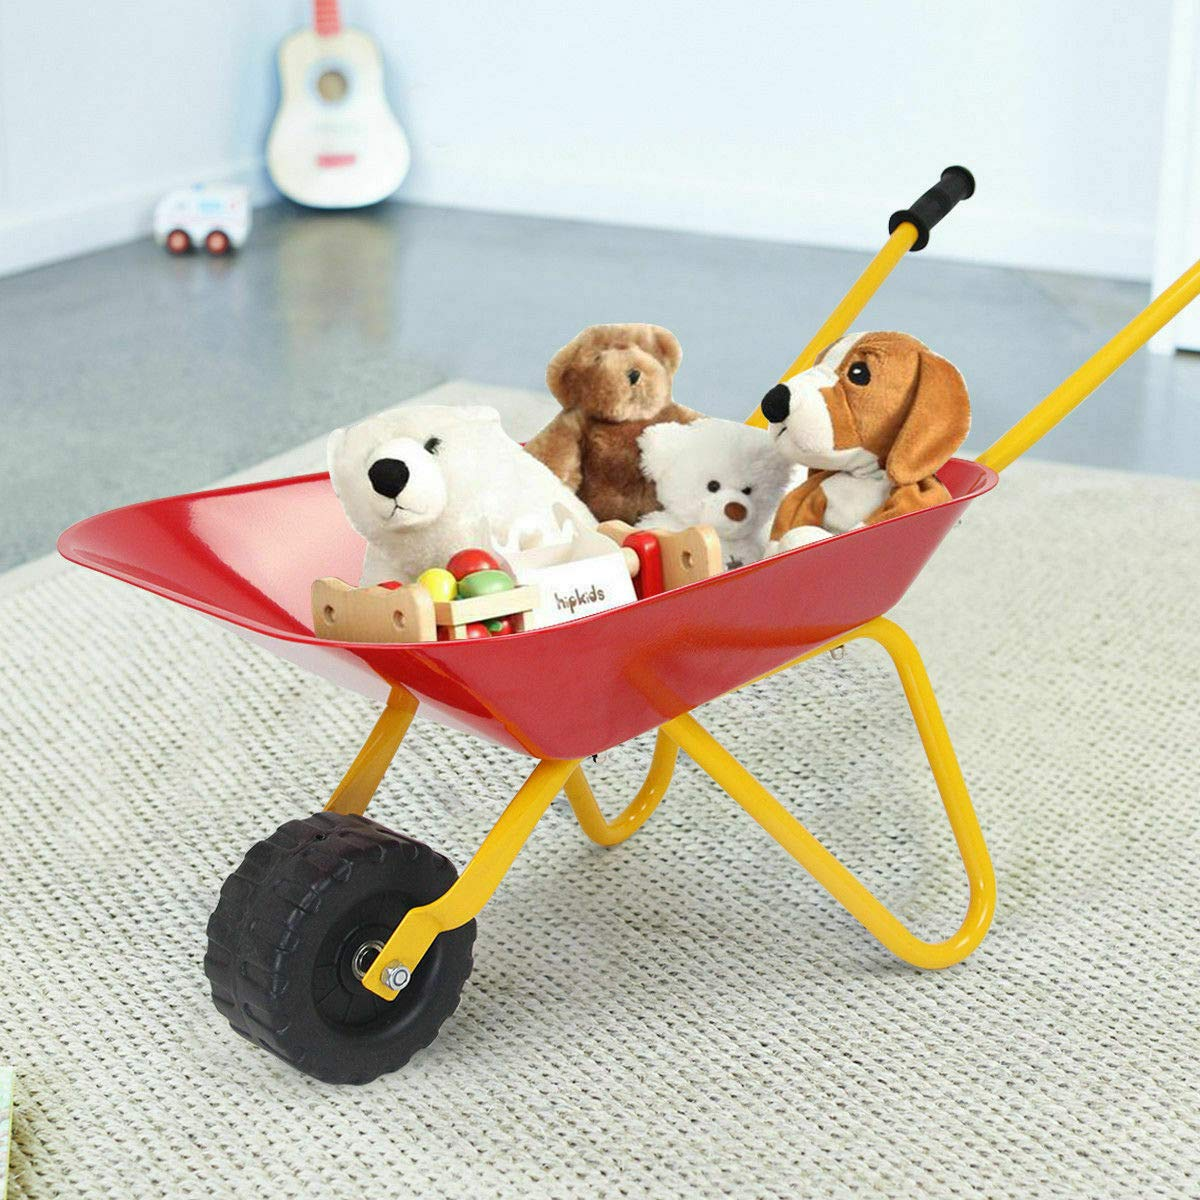 Heize best price Red Kids Metal Wheelbarrow Children's Size Outdoor Garden Backyard Play Toy by Heize best price (Image #3)